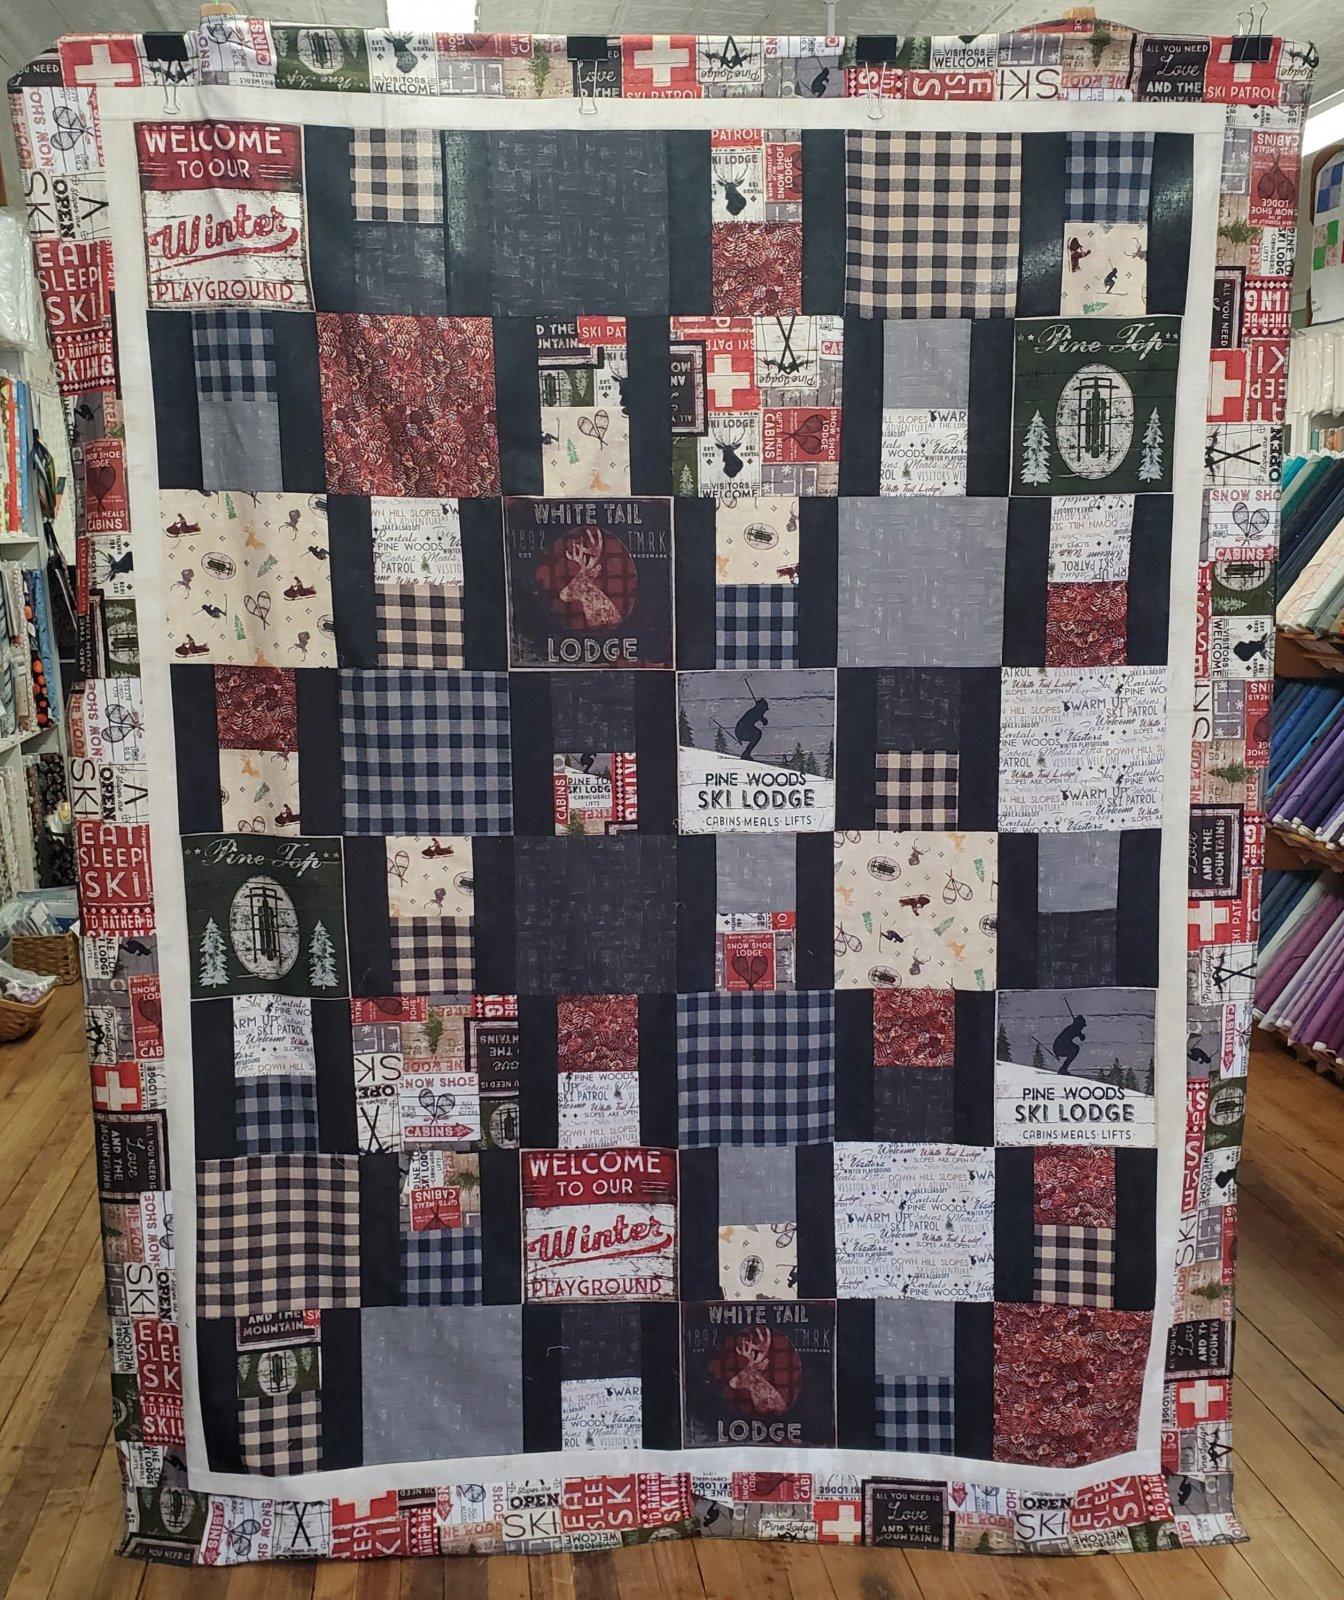 Winter Playground Quilt Kit